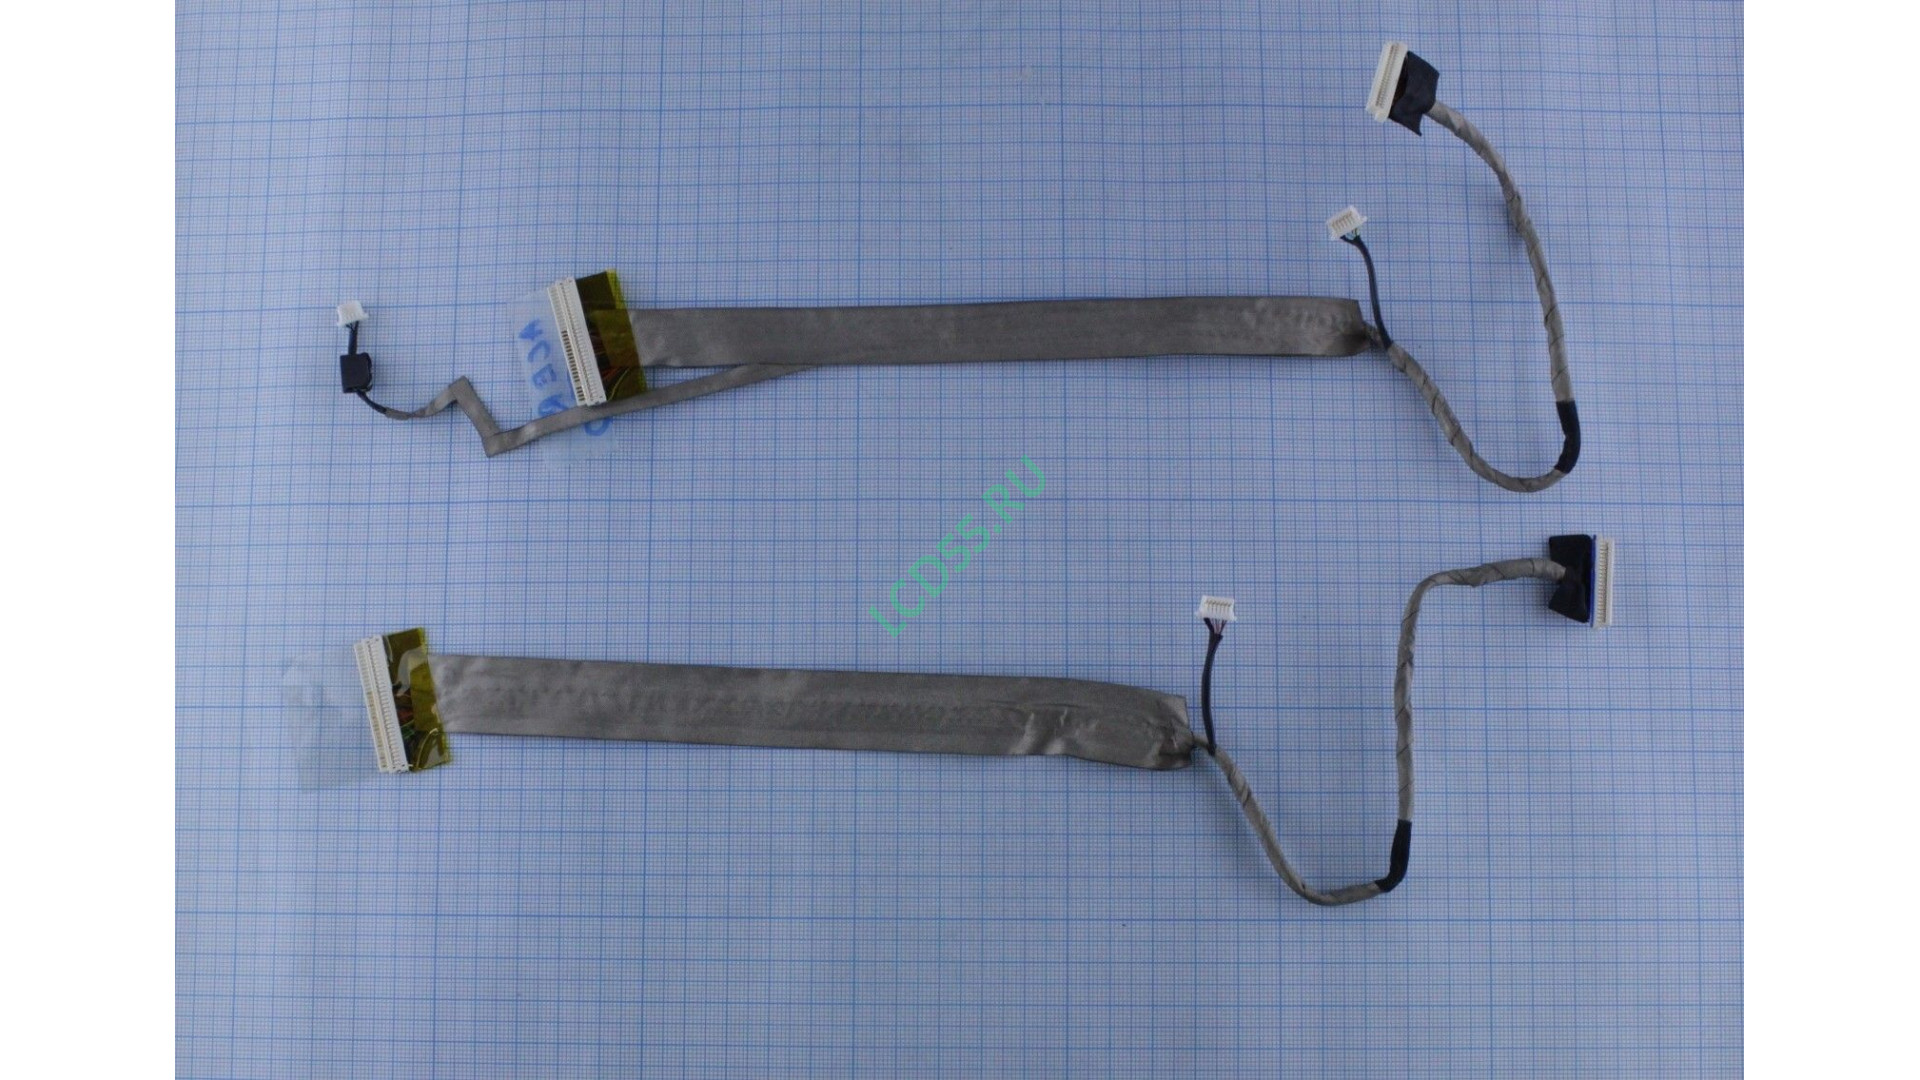 Шлейф матрицы Acer Aspire 5520, 5315, 5310, 5720, 5715, eMachines E510